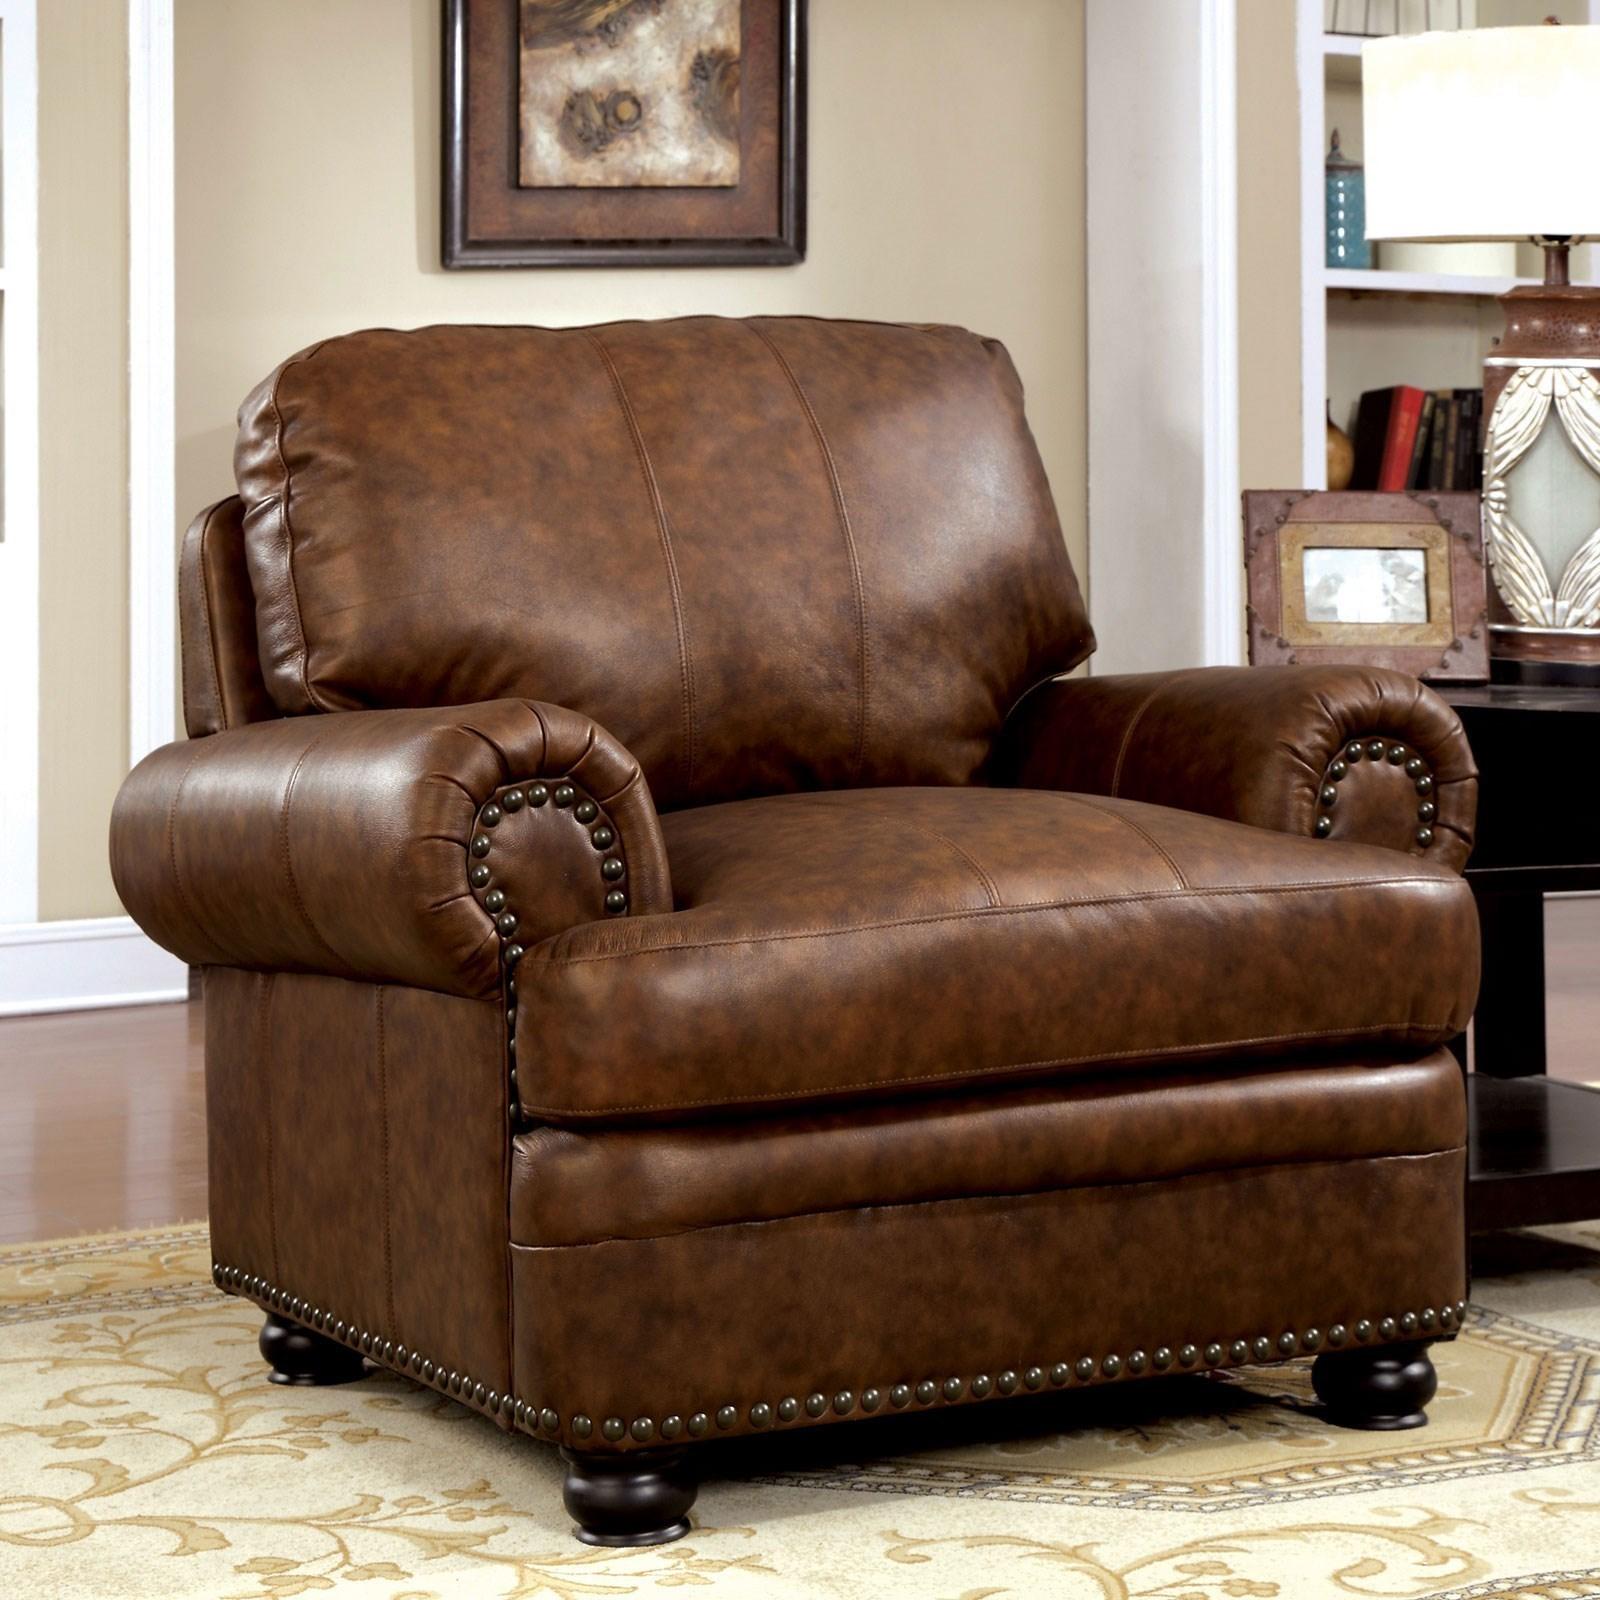 Rheinhardt Chair at Household Furniture